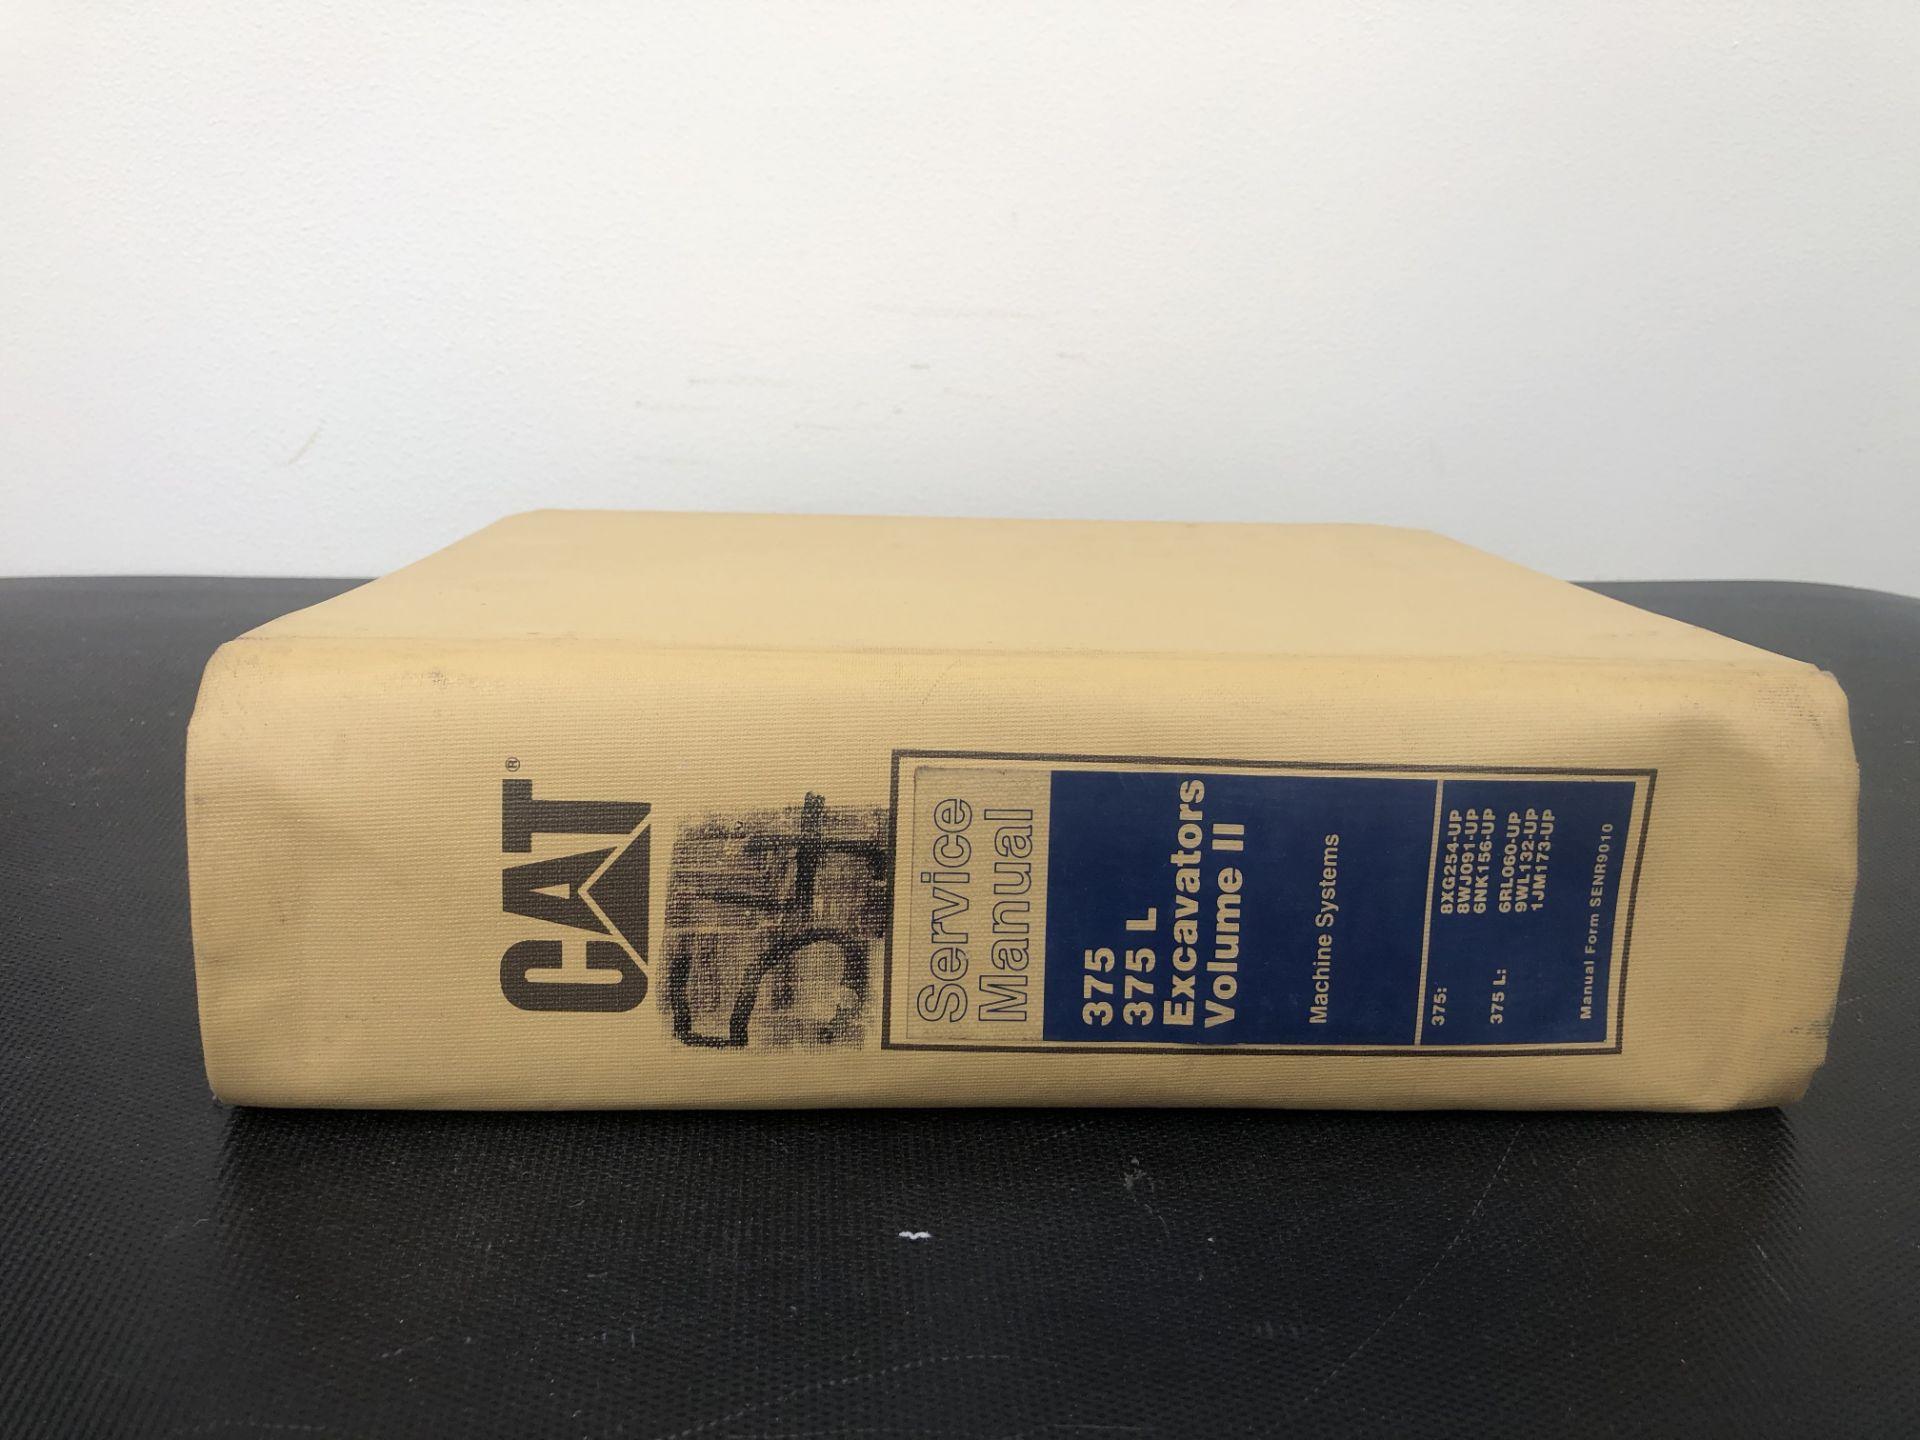 CATERPILLAR 375 375L VOLUME II SERVICE MANUAL, GENUINE FACTORY CAT WORKSHOP MANUAL